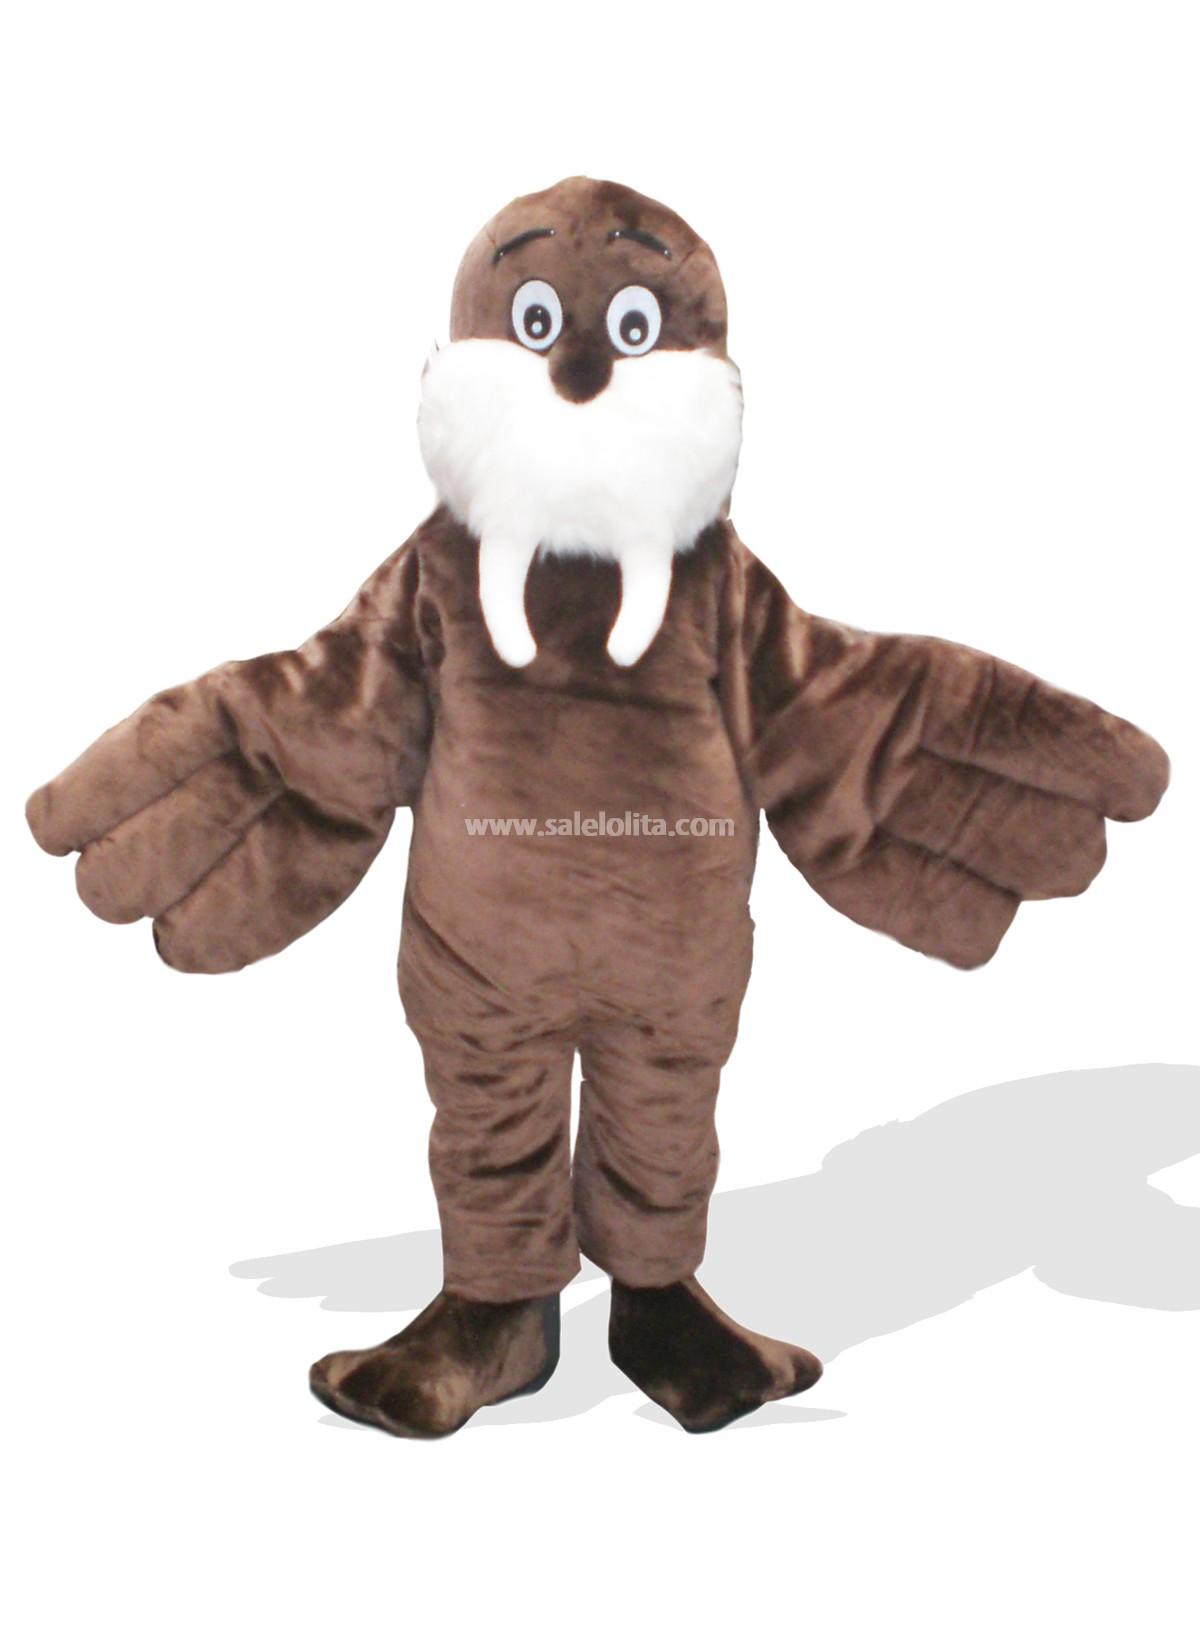 Adult Sea Lion Costume. Loading  sc 1 st  Salelolita & Adult Sea Lion Costume - SaleLoLita.com